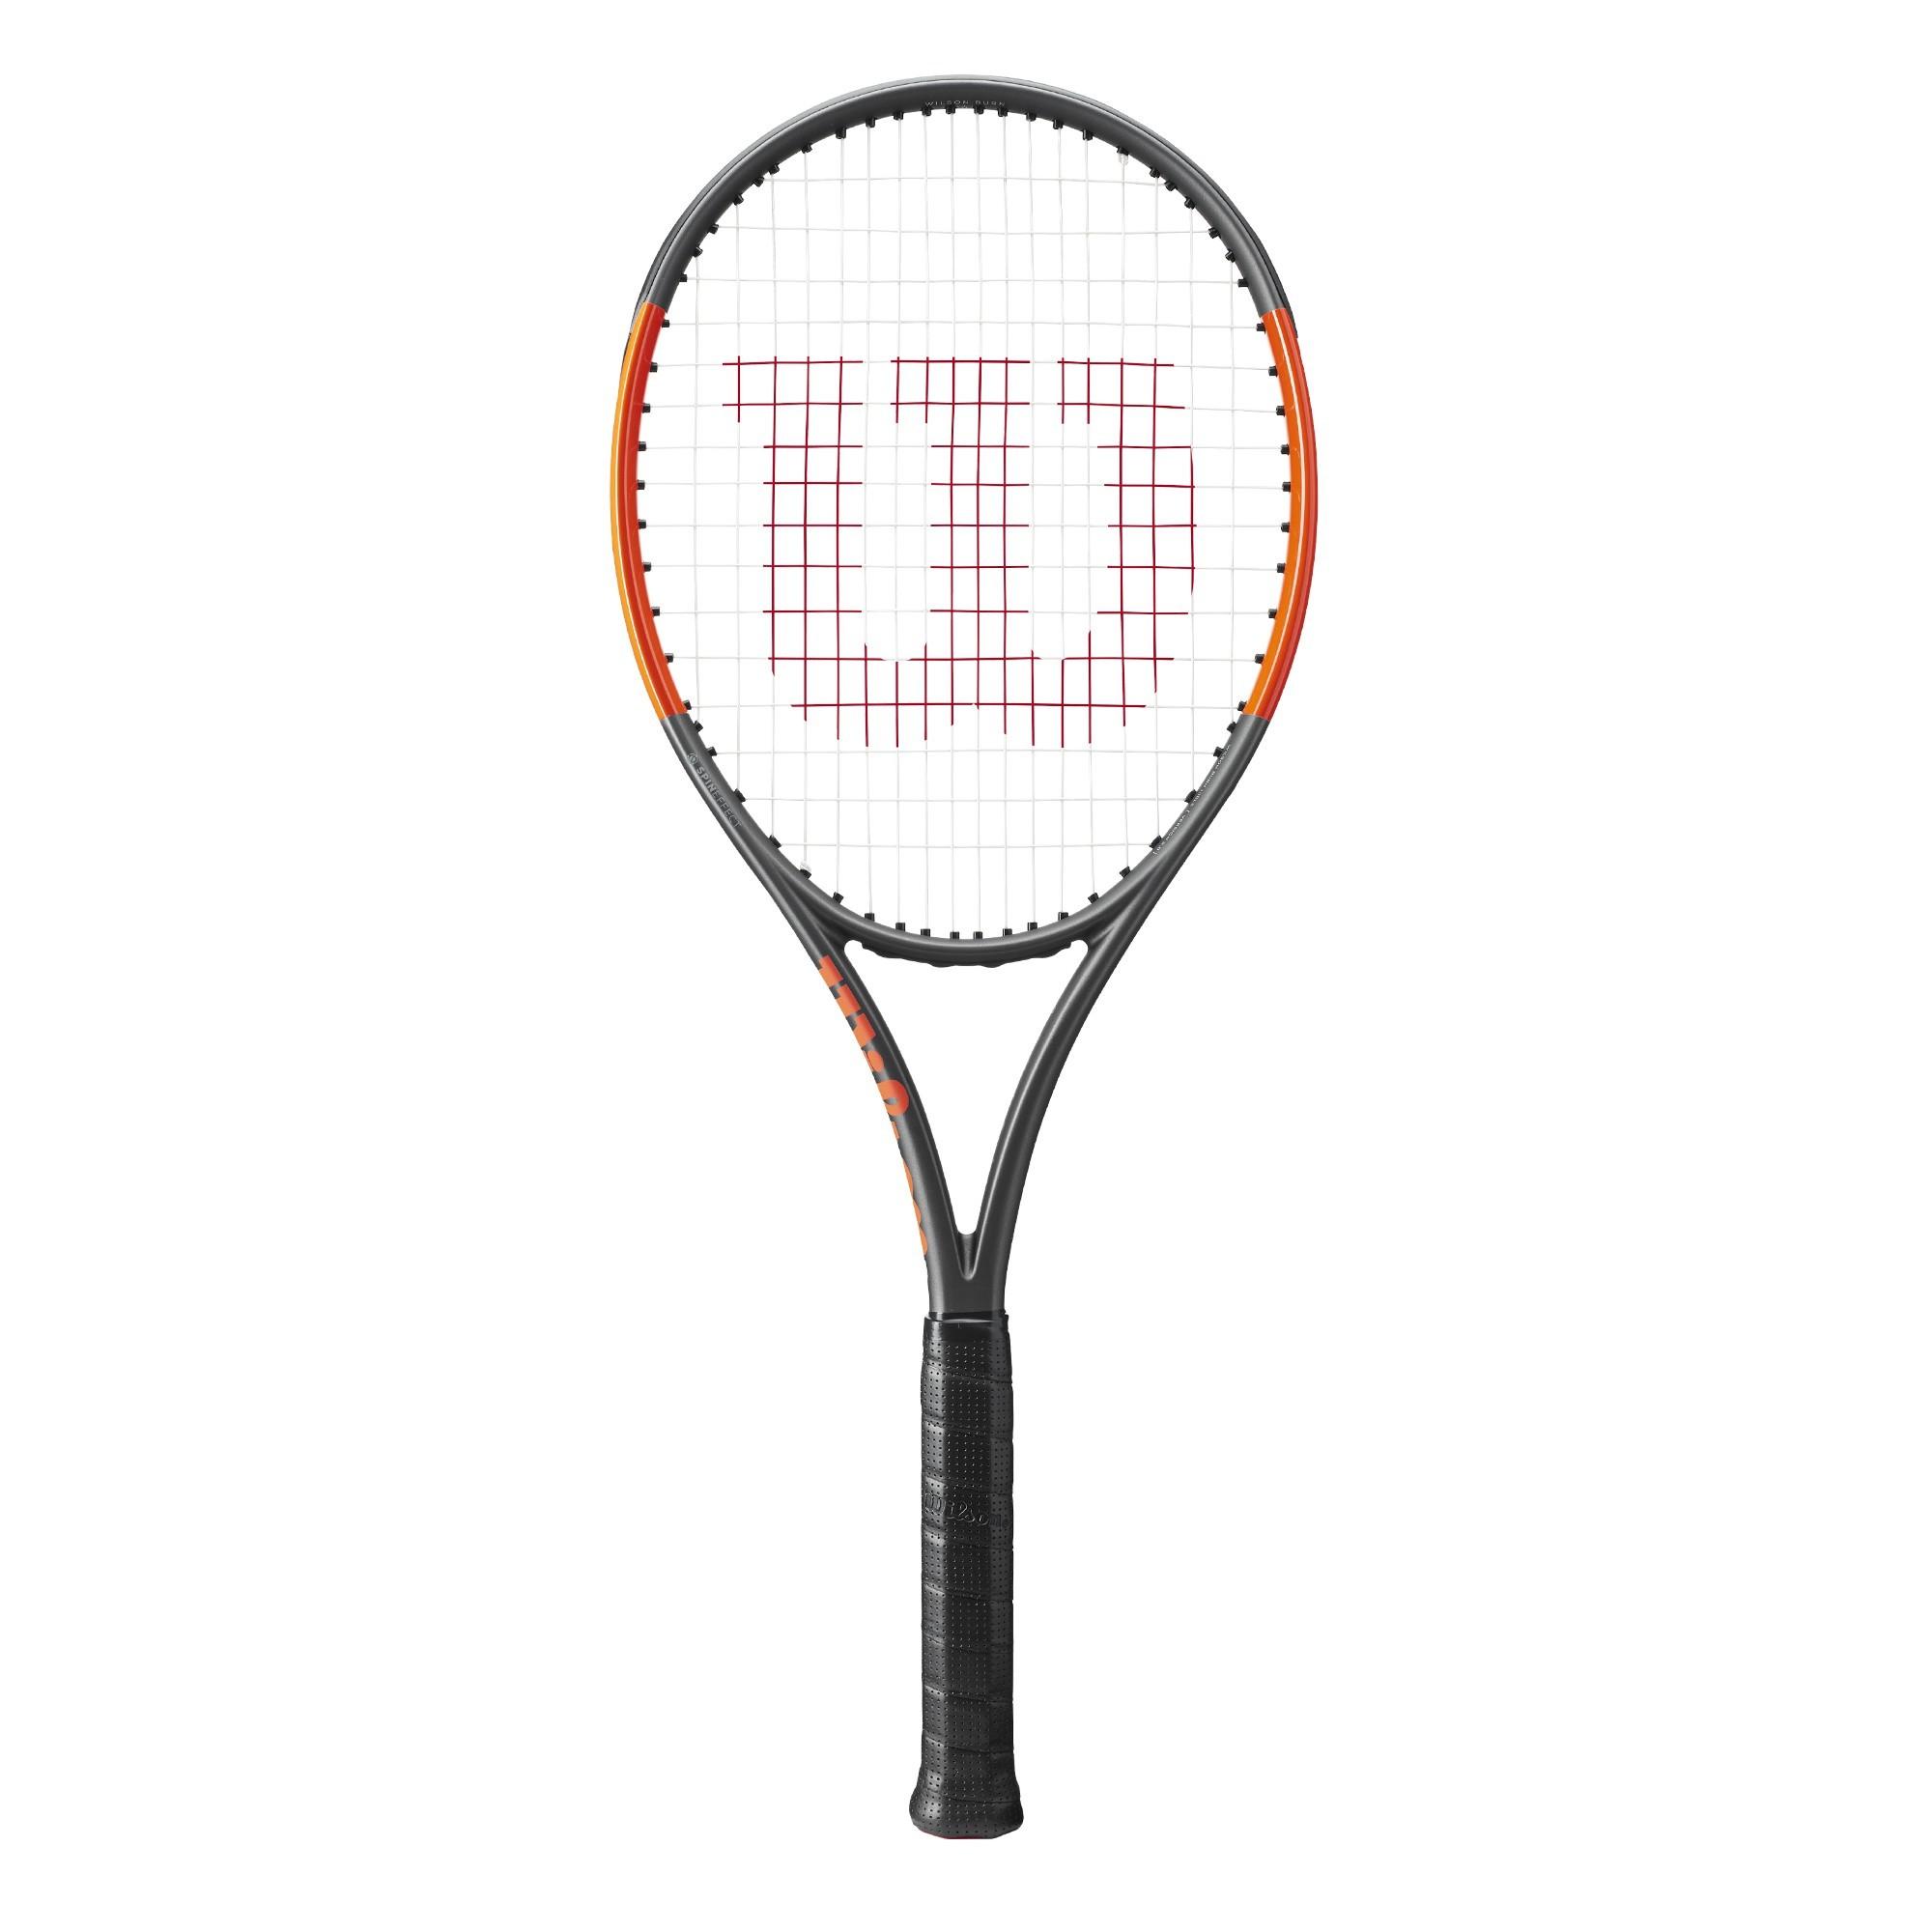 Rakieta tenisowa Wilson Burn 100LS + naciąg Luxilon